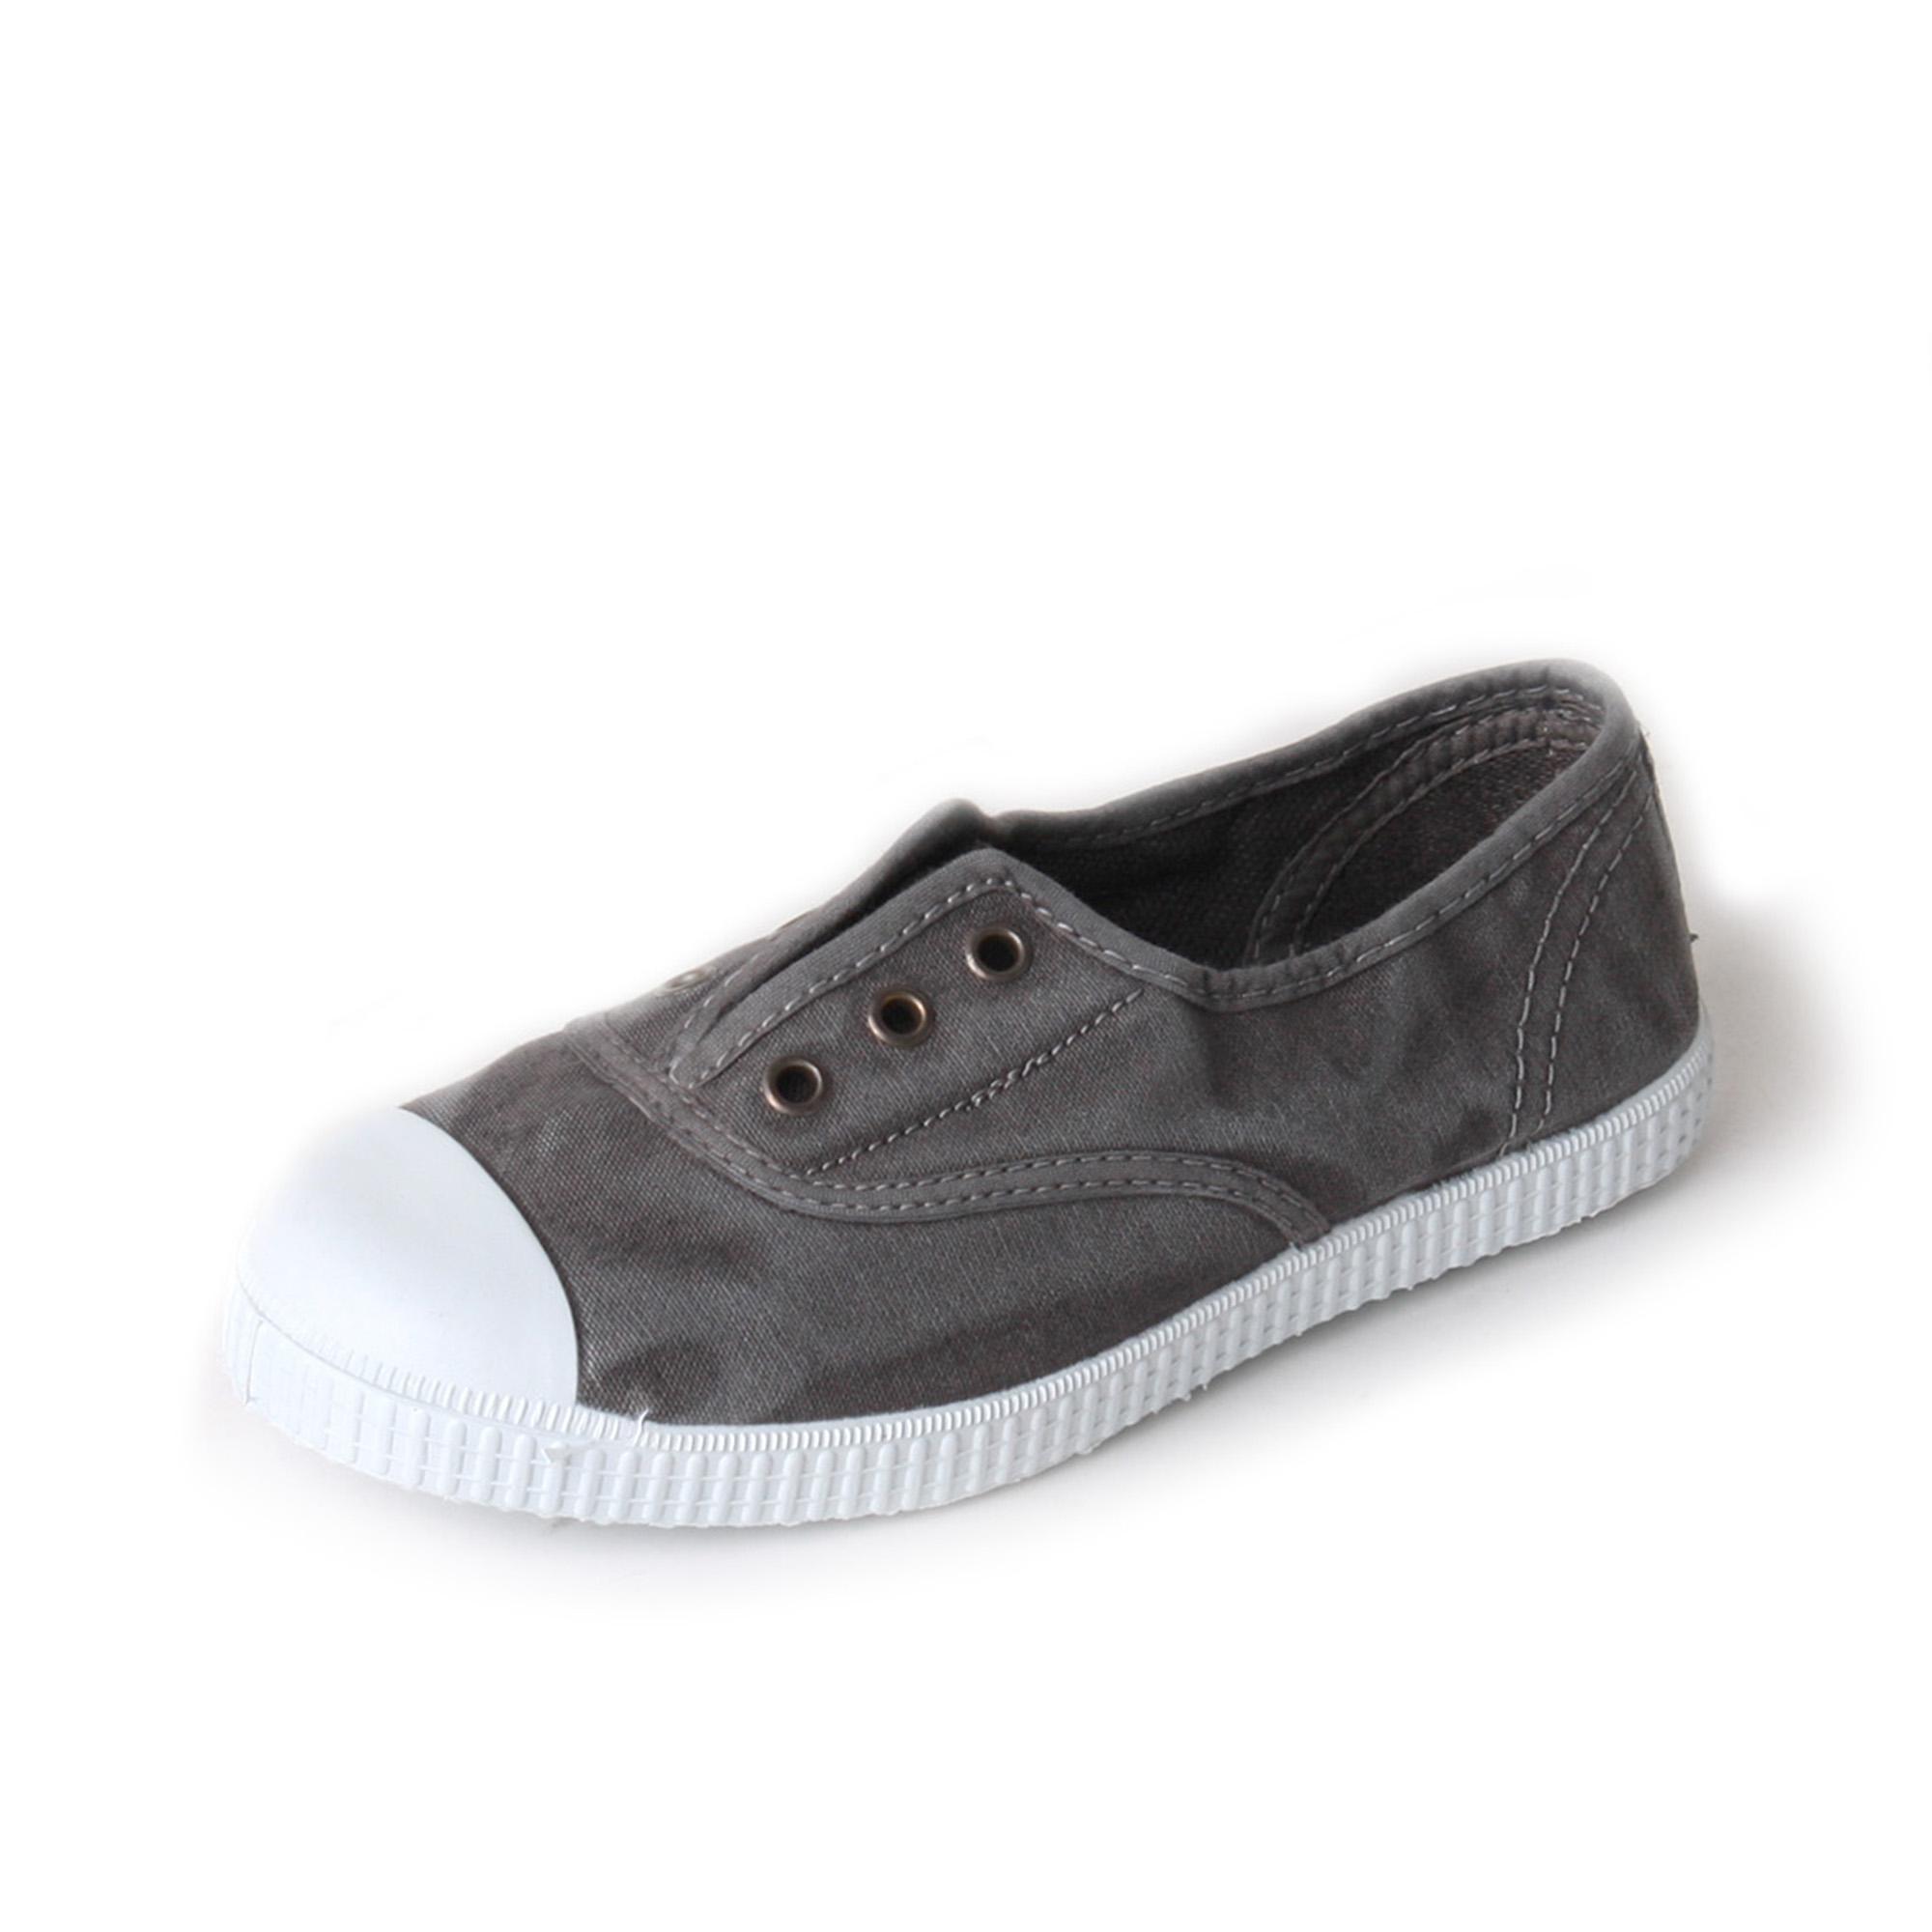 Venta Barata Última La Venta Caliente Sneakers grigie per bambini Chipie IvR93cSv